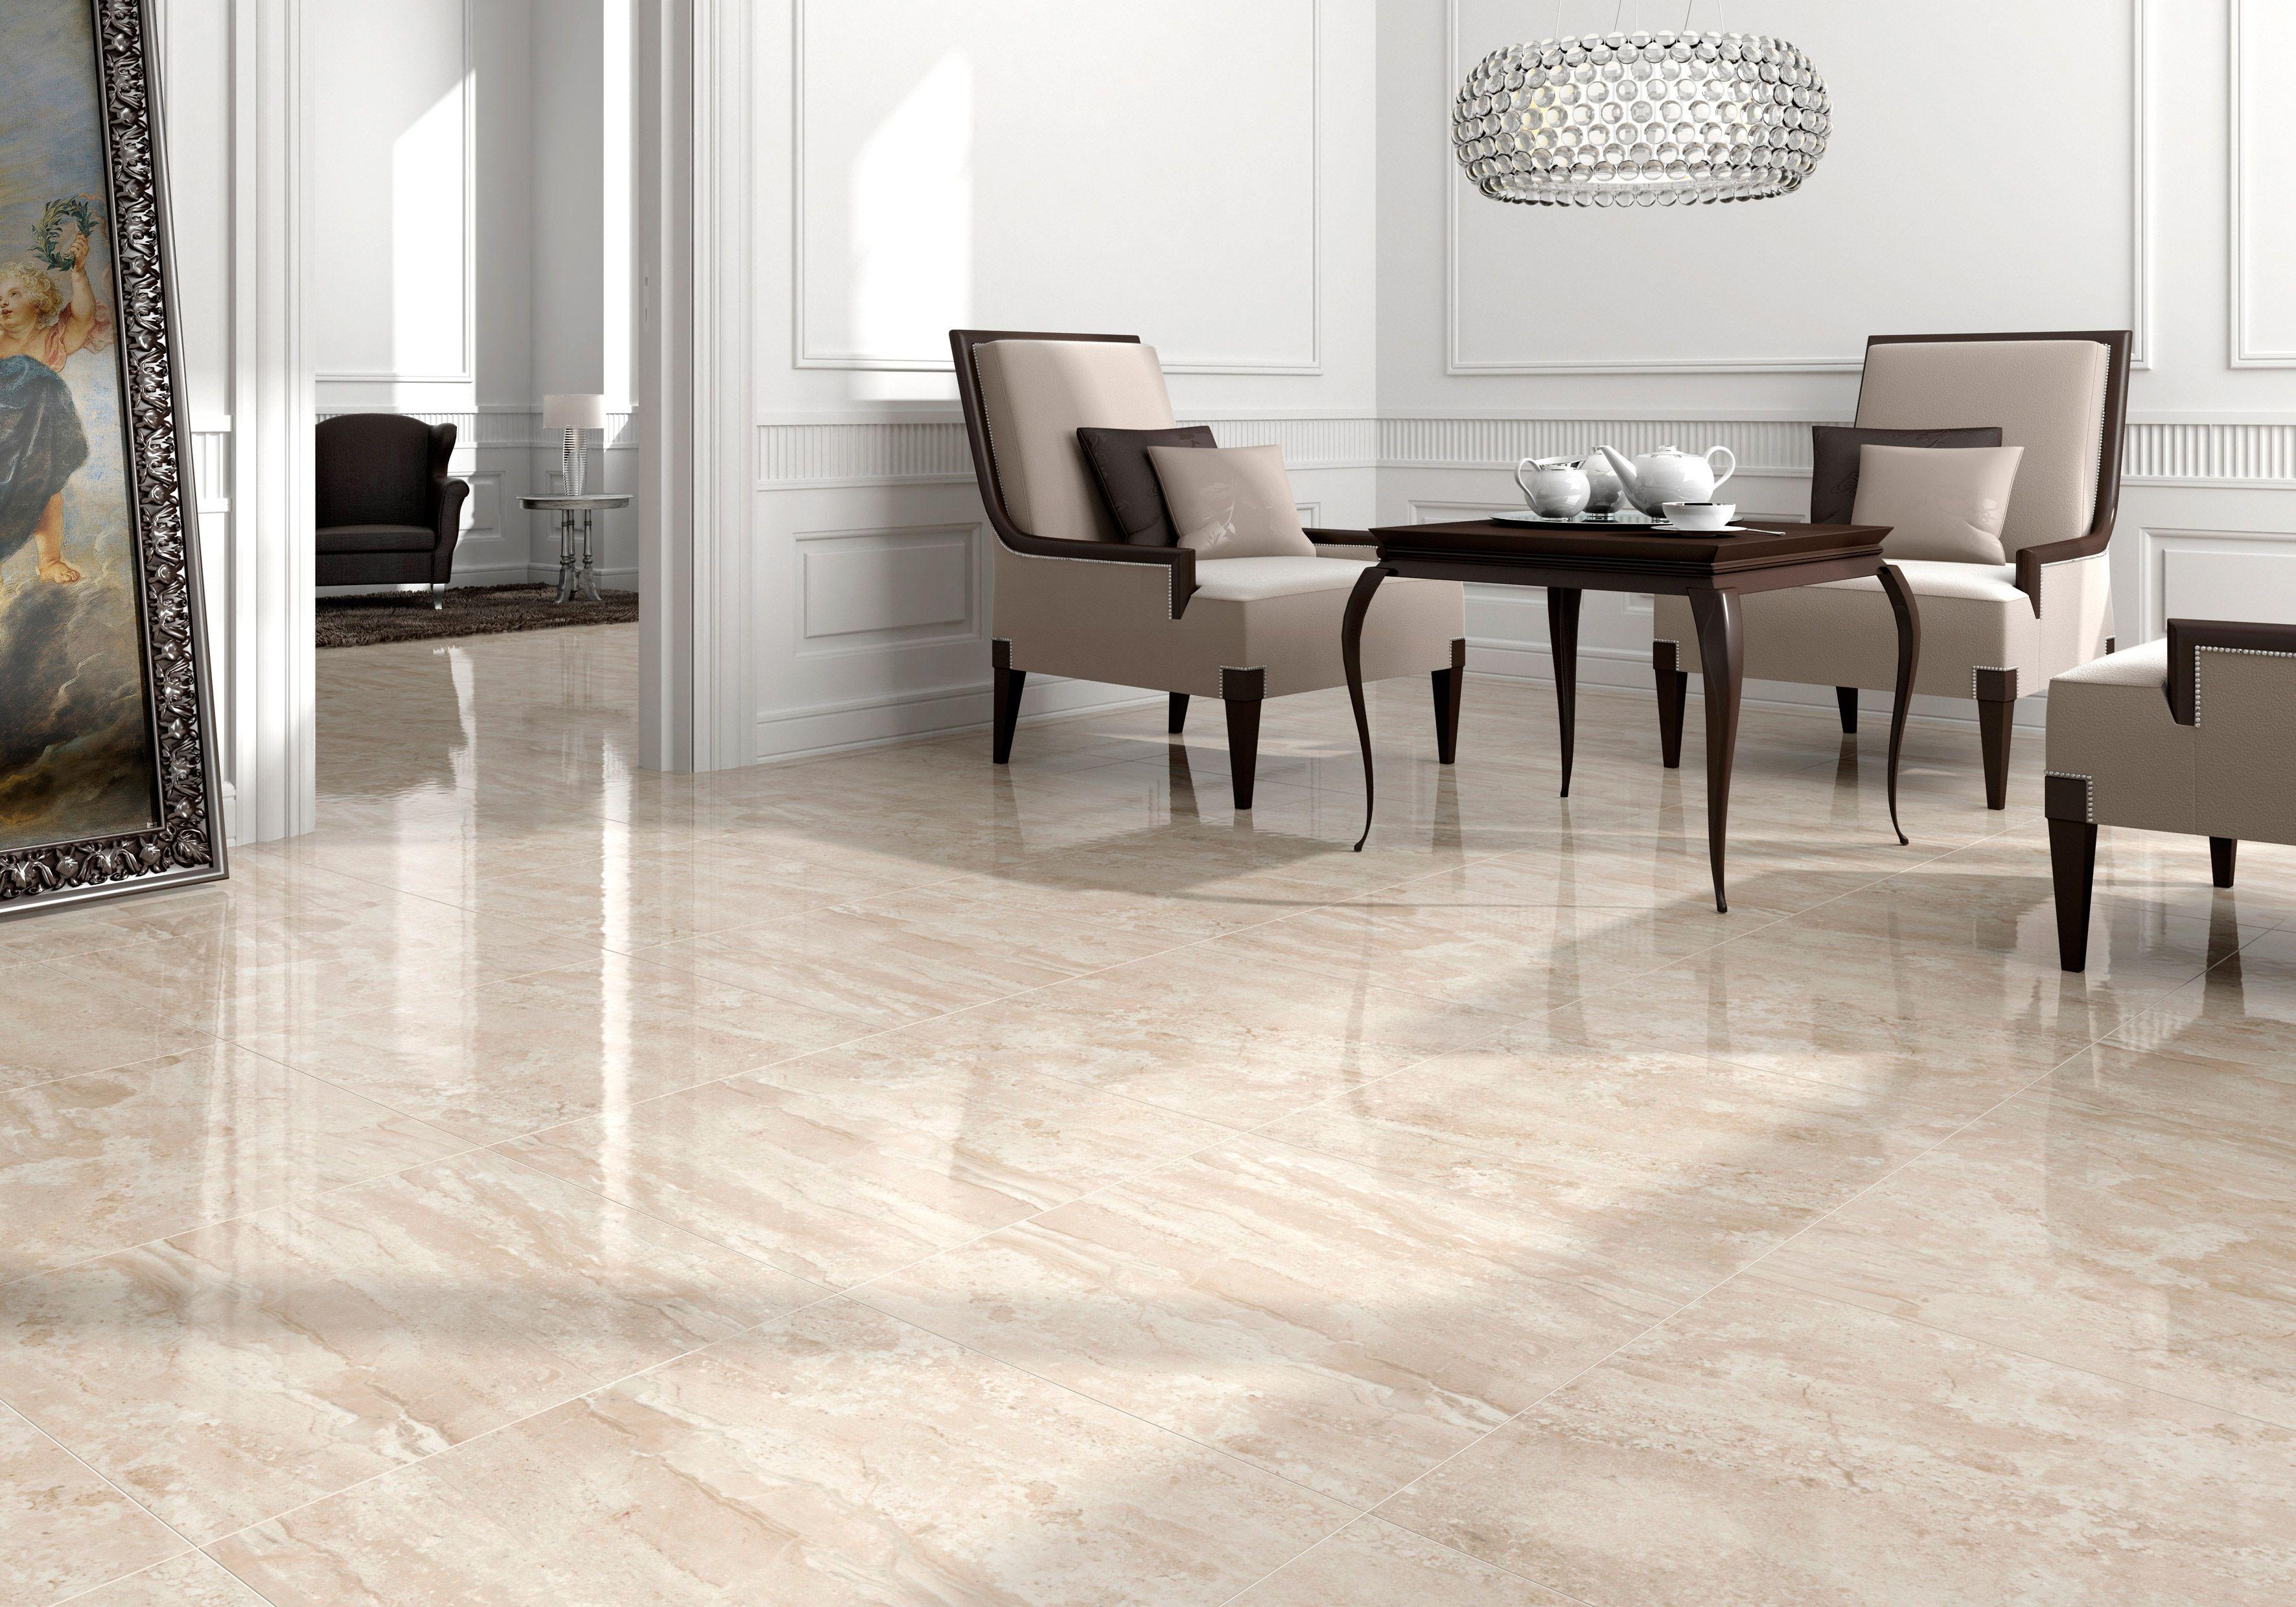 kaleidoscope tile porcelain commercial product geometric cl floors triangle tiles ant classic ks